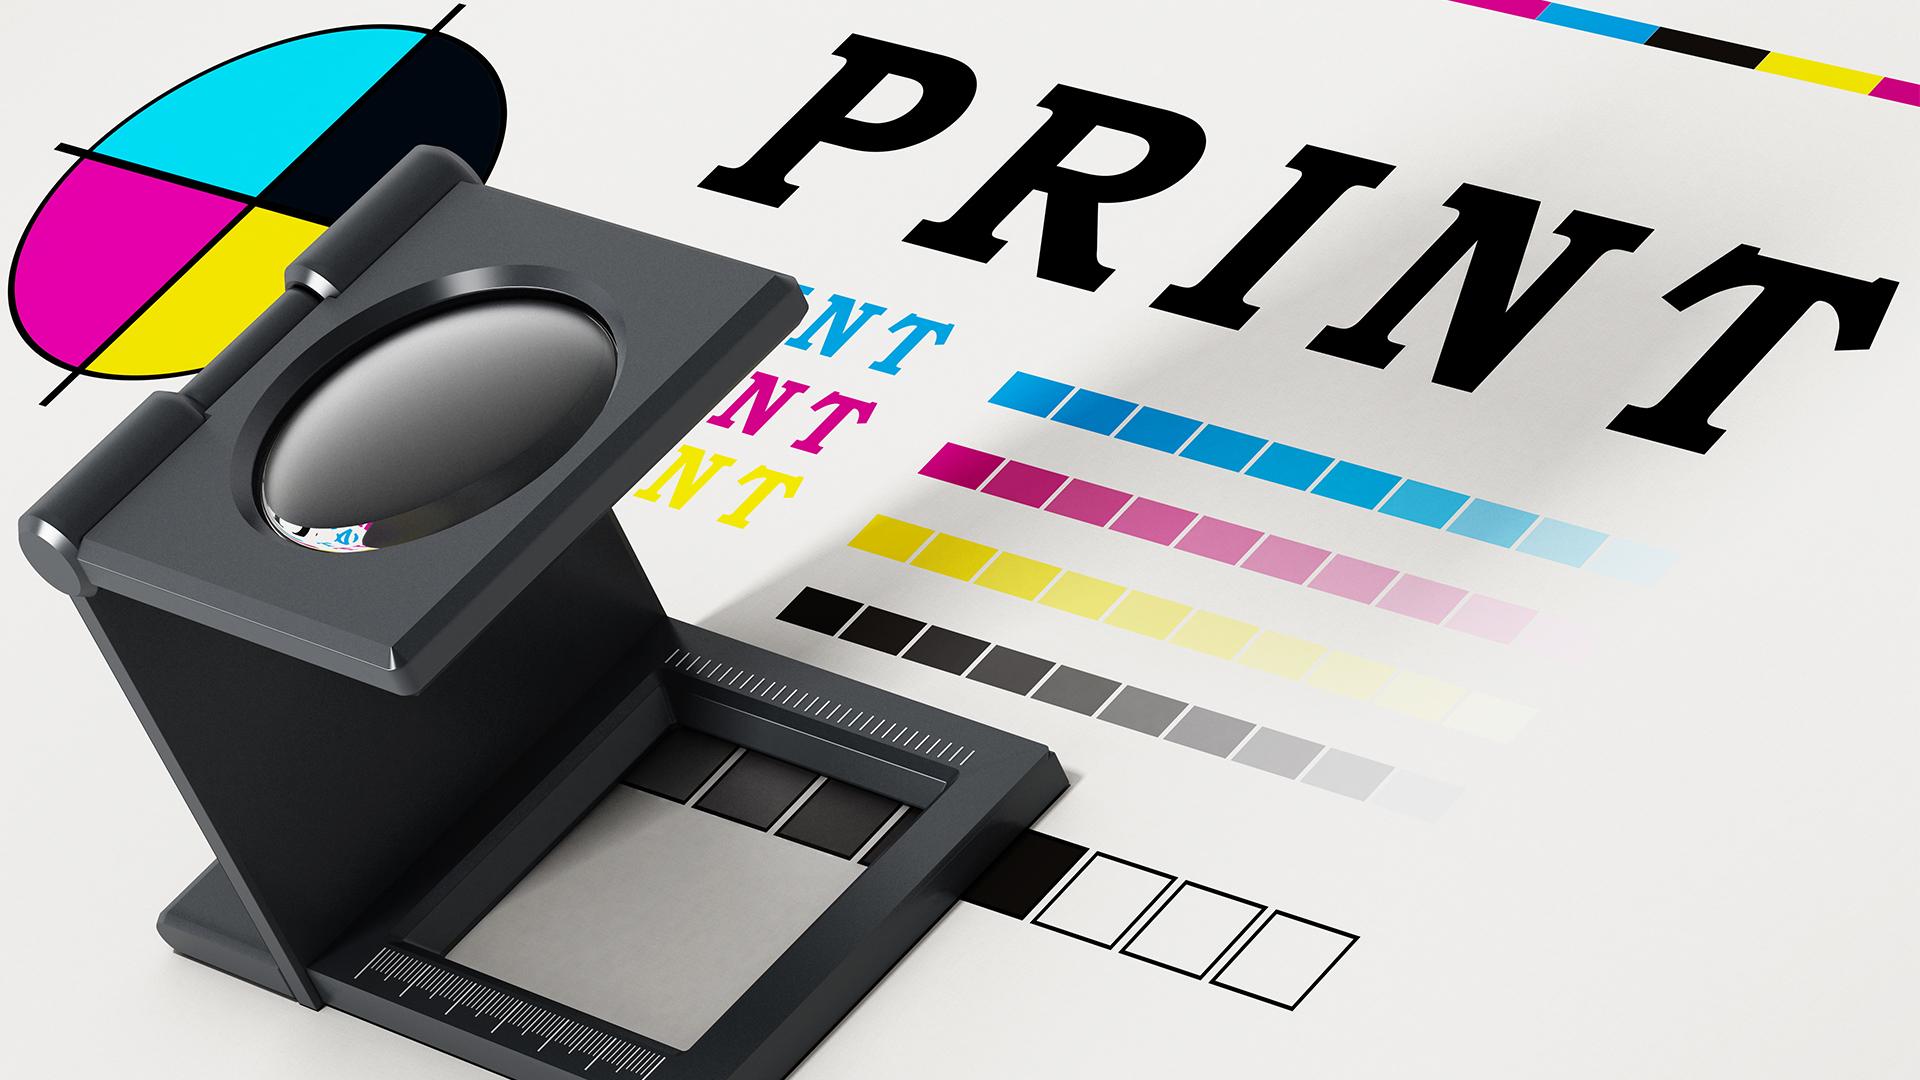 5 Tips for Printing Your Photos | Photofocus